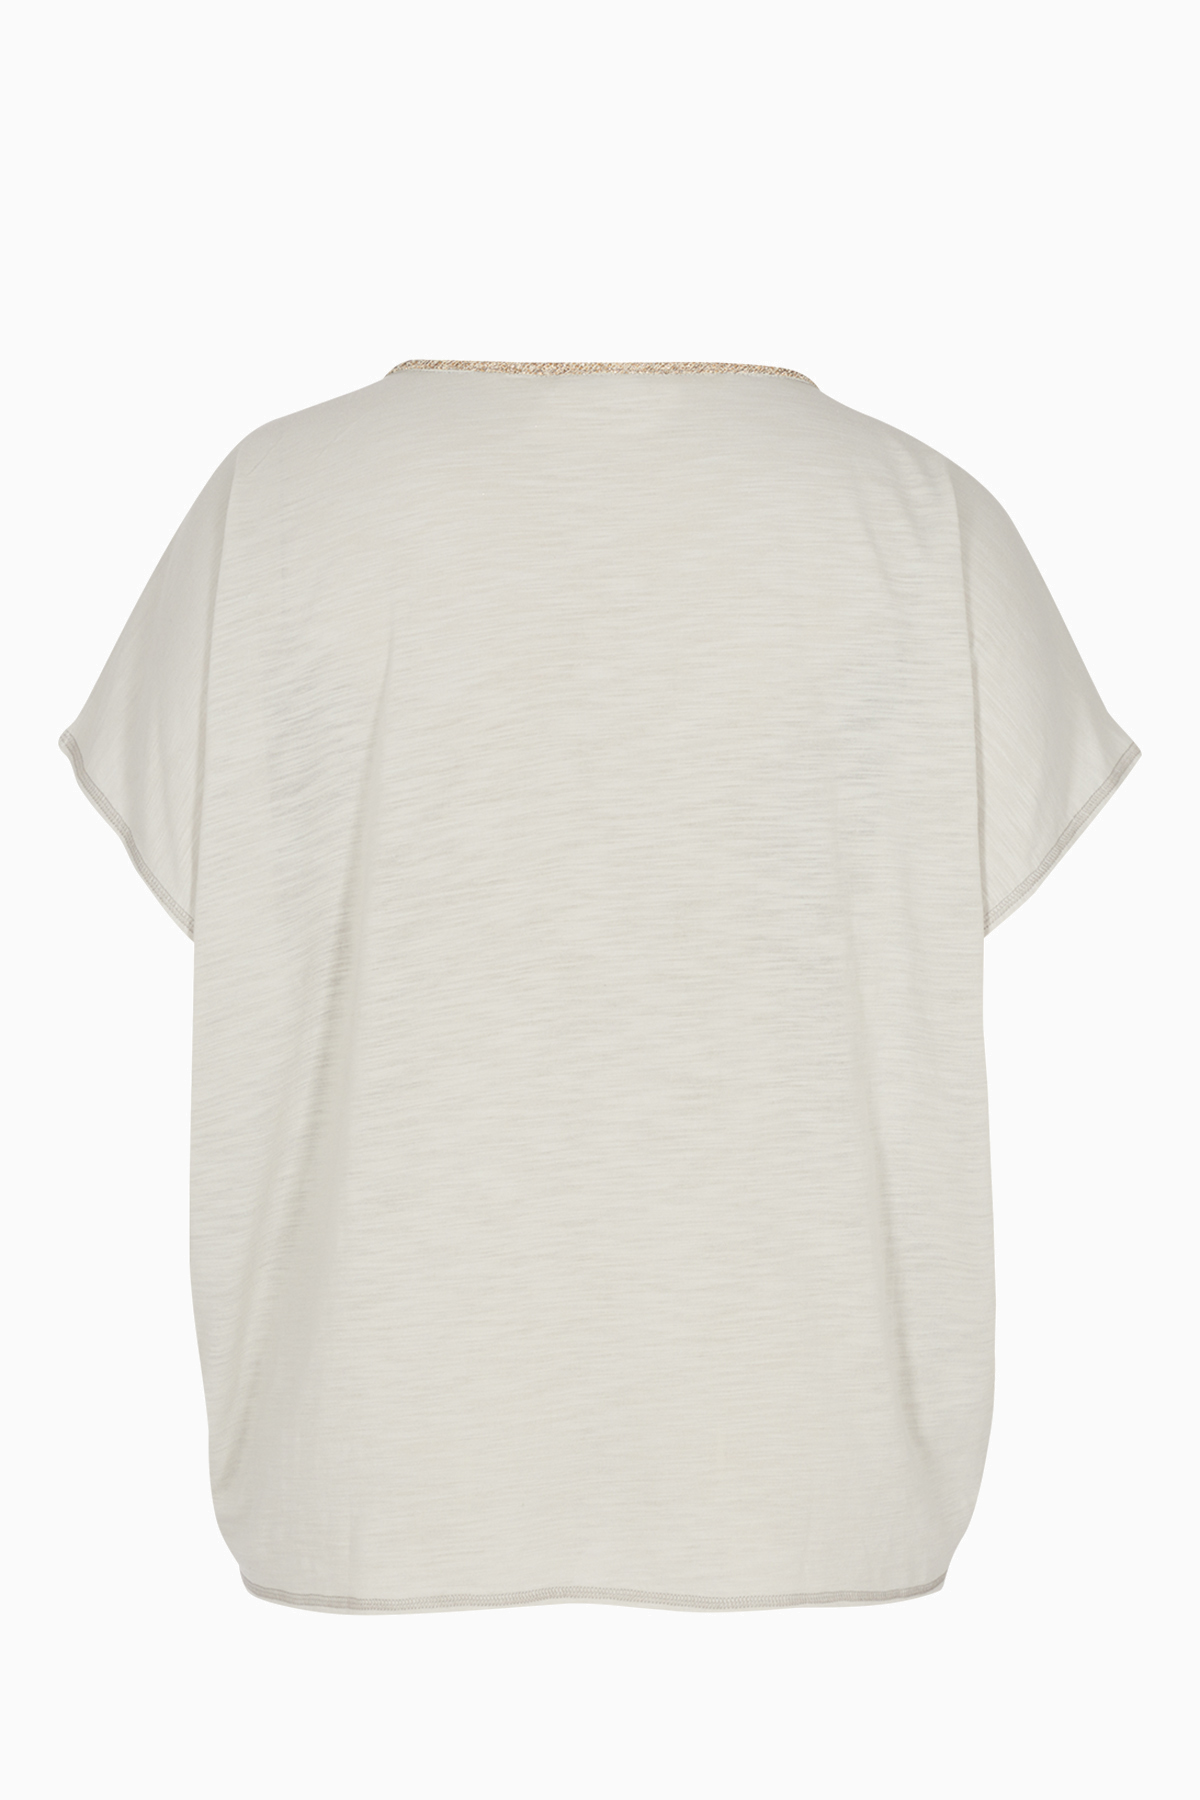 Lysegrå Kortærmet T-shirt fra Zizzi – Køb Lysegrå Kortærmet T-shirt fra str. 42-44-54-56 her